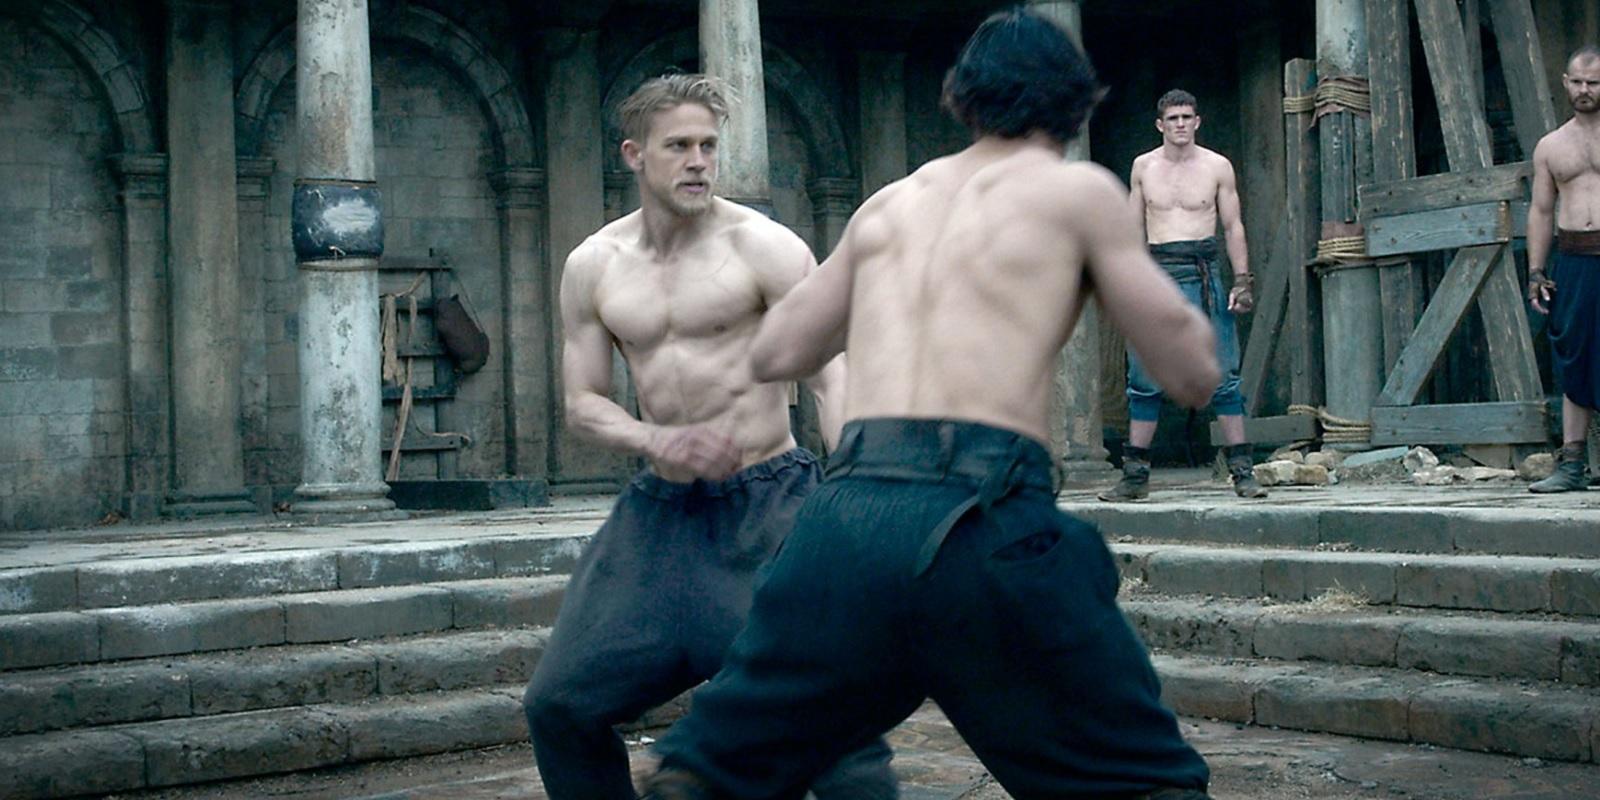 charlie-hunnam-fighting-in-king-arthur-legend-of-the-sword.jpg